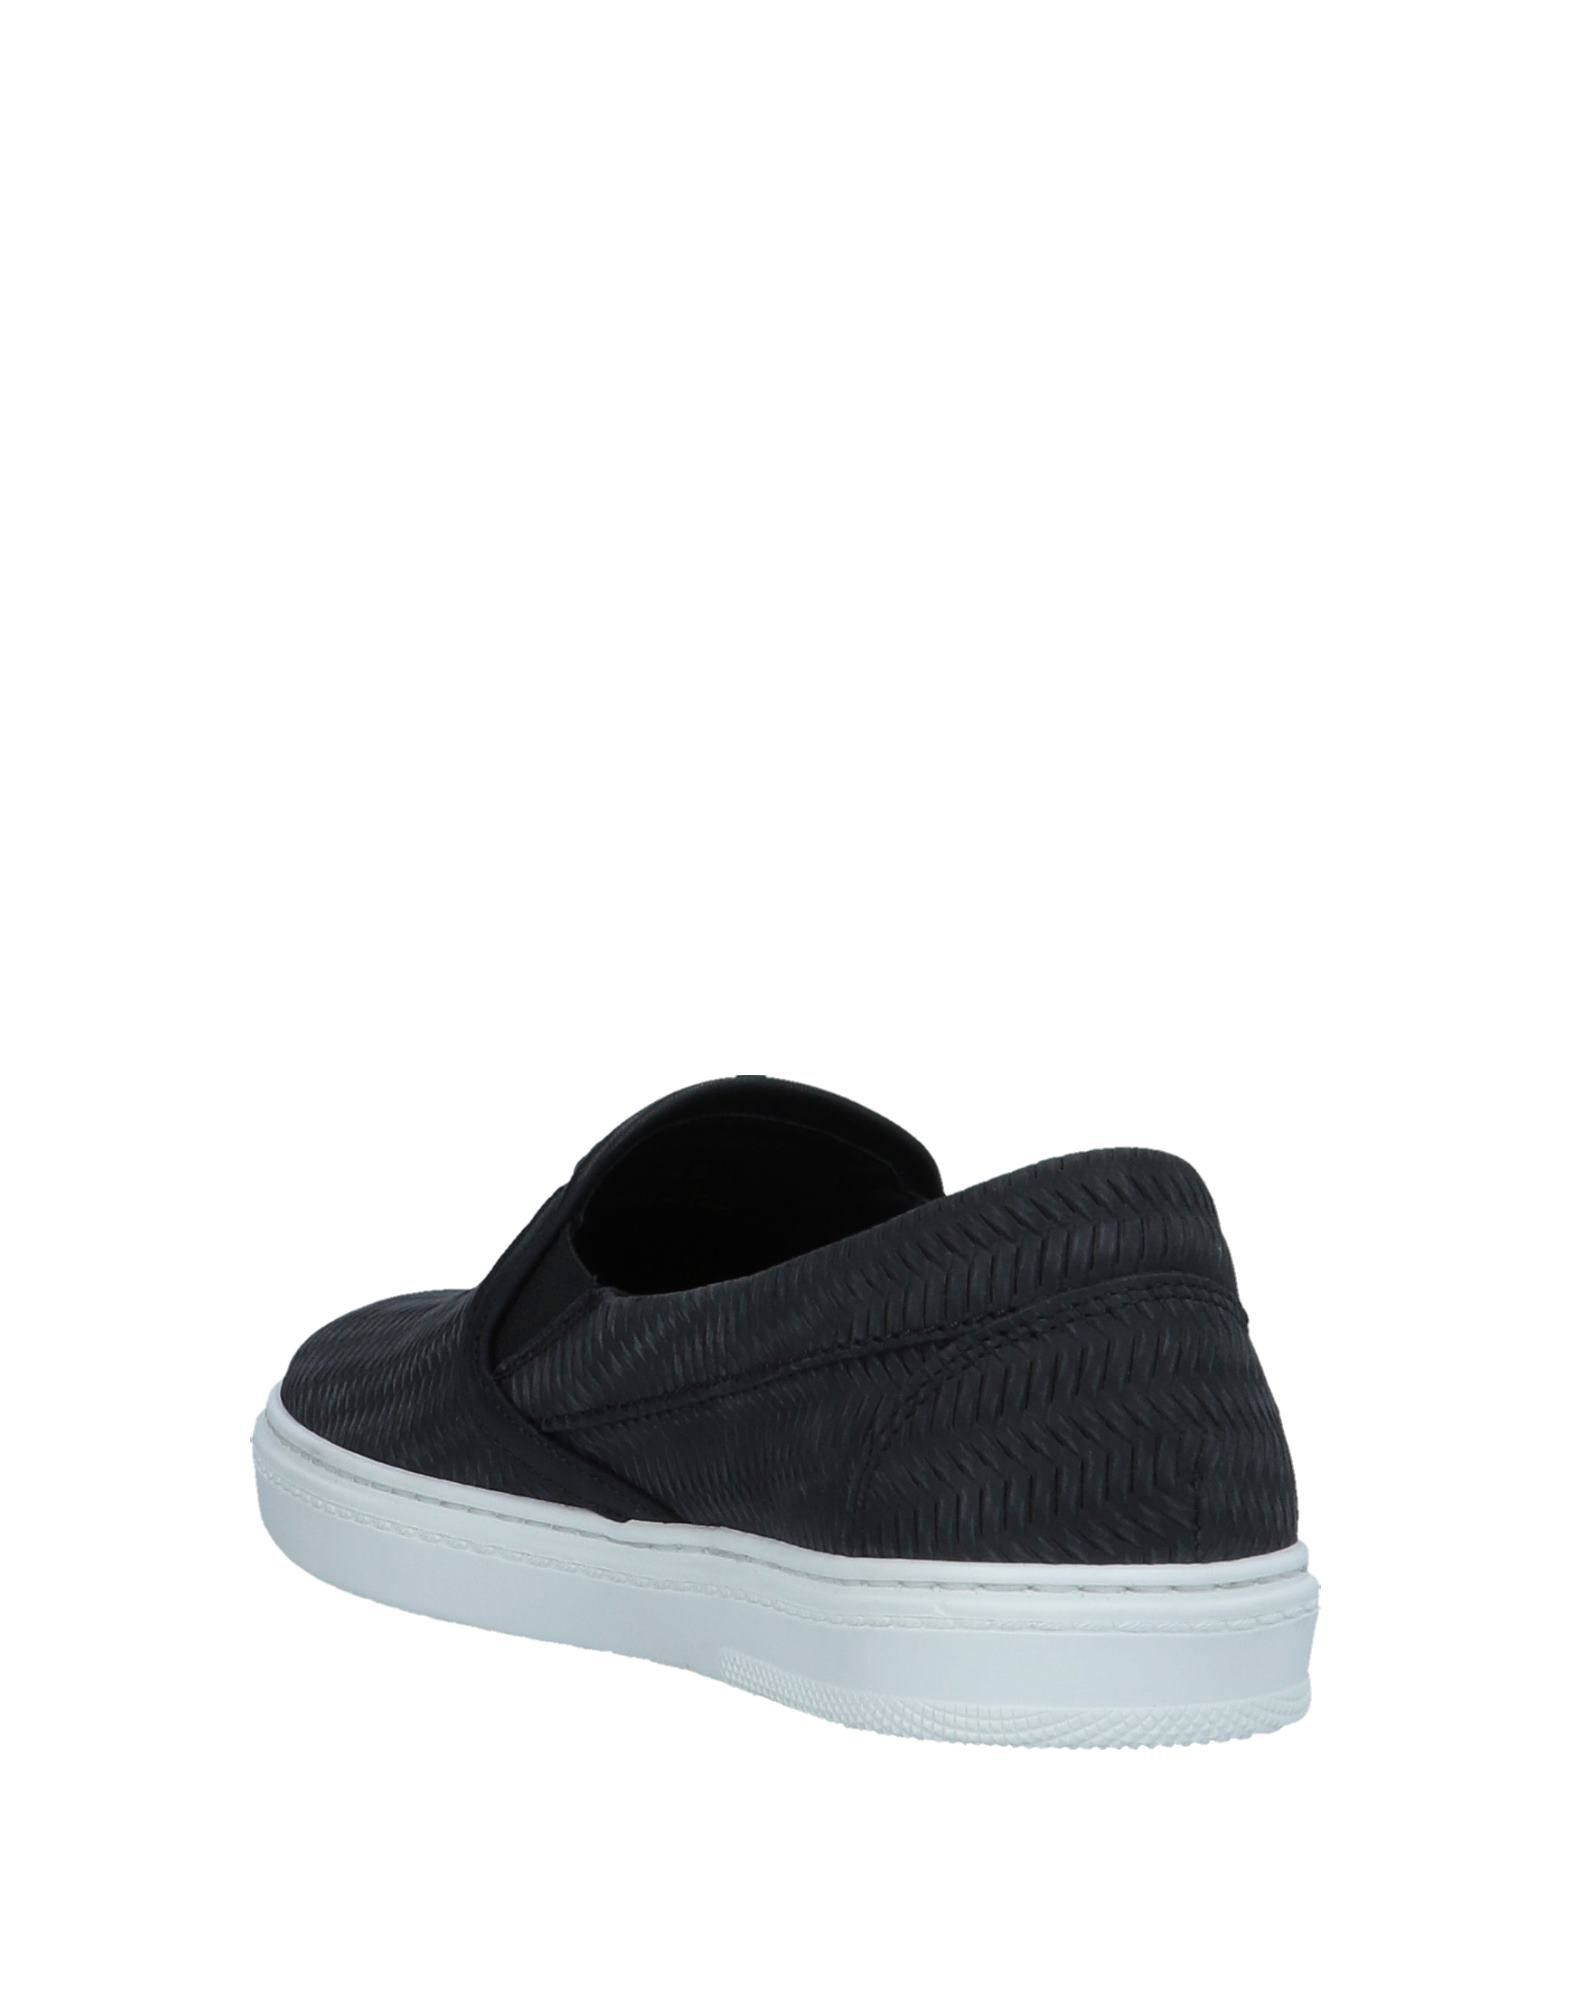 Jimmy Choo Sneakers Herren    11538381TJ Neue Schuhe 2db9cc